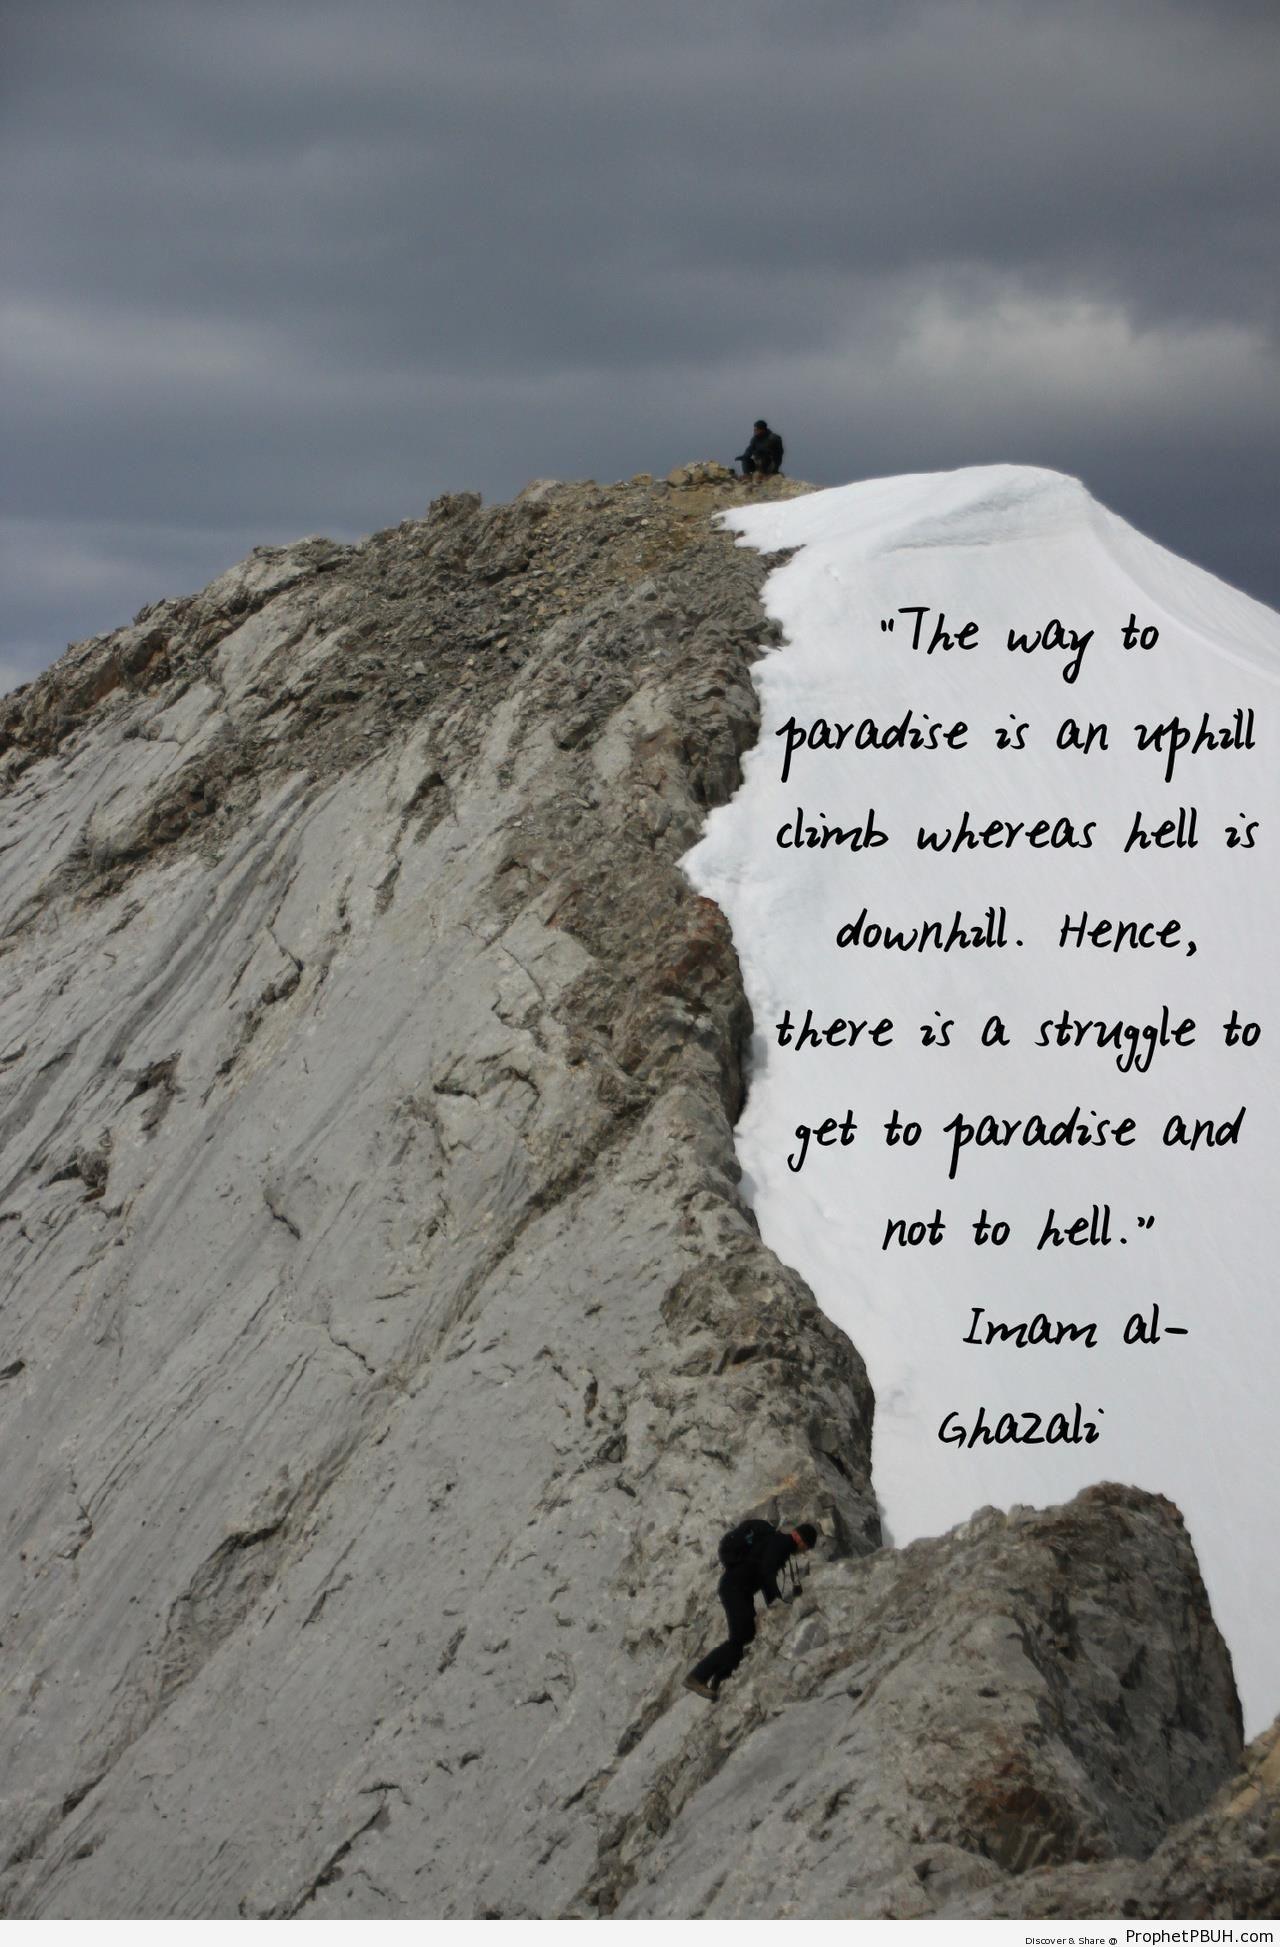 The Way to Paradise is Uphill (Abu Hamid al-Ghazali Quote) - Abu Hamid al-Ghazali Quotes